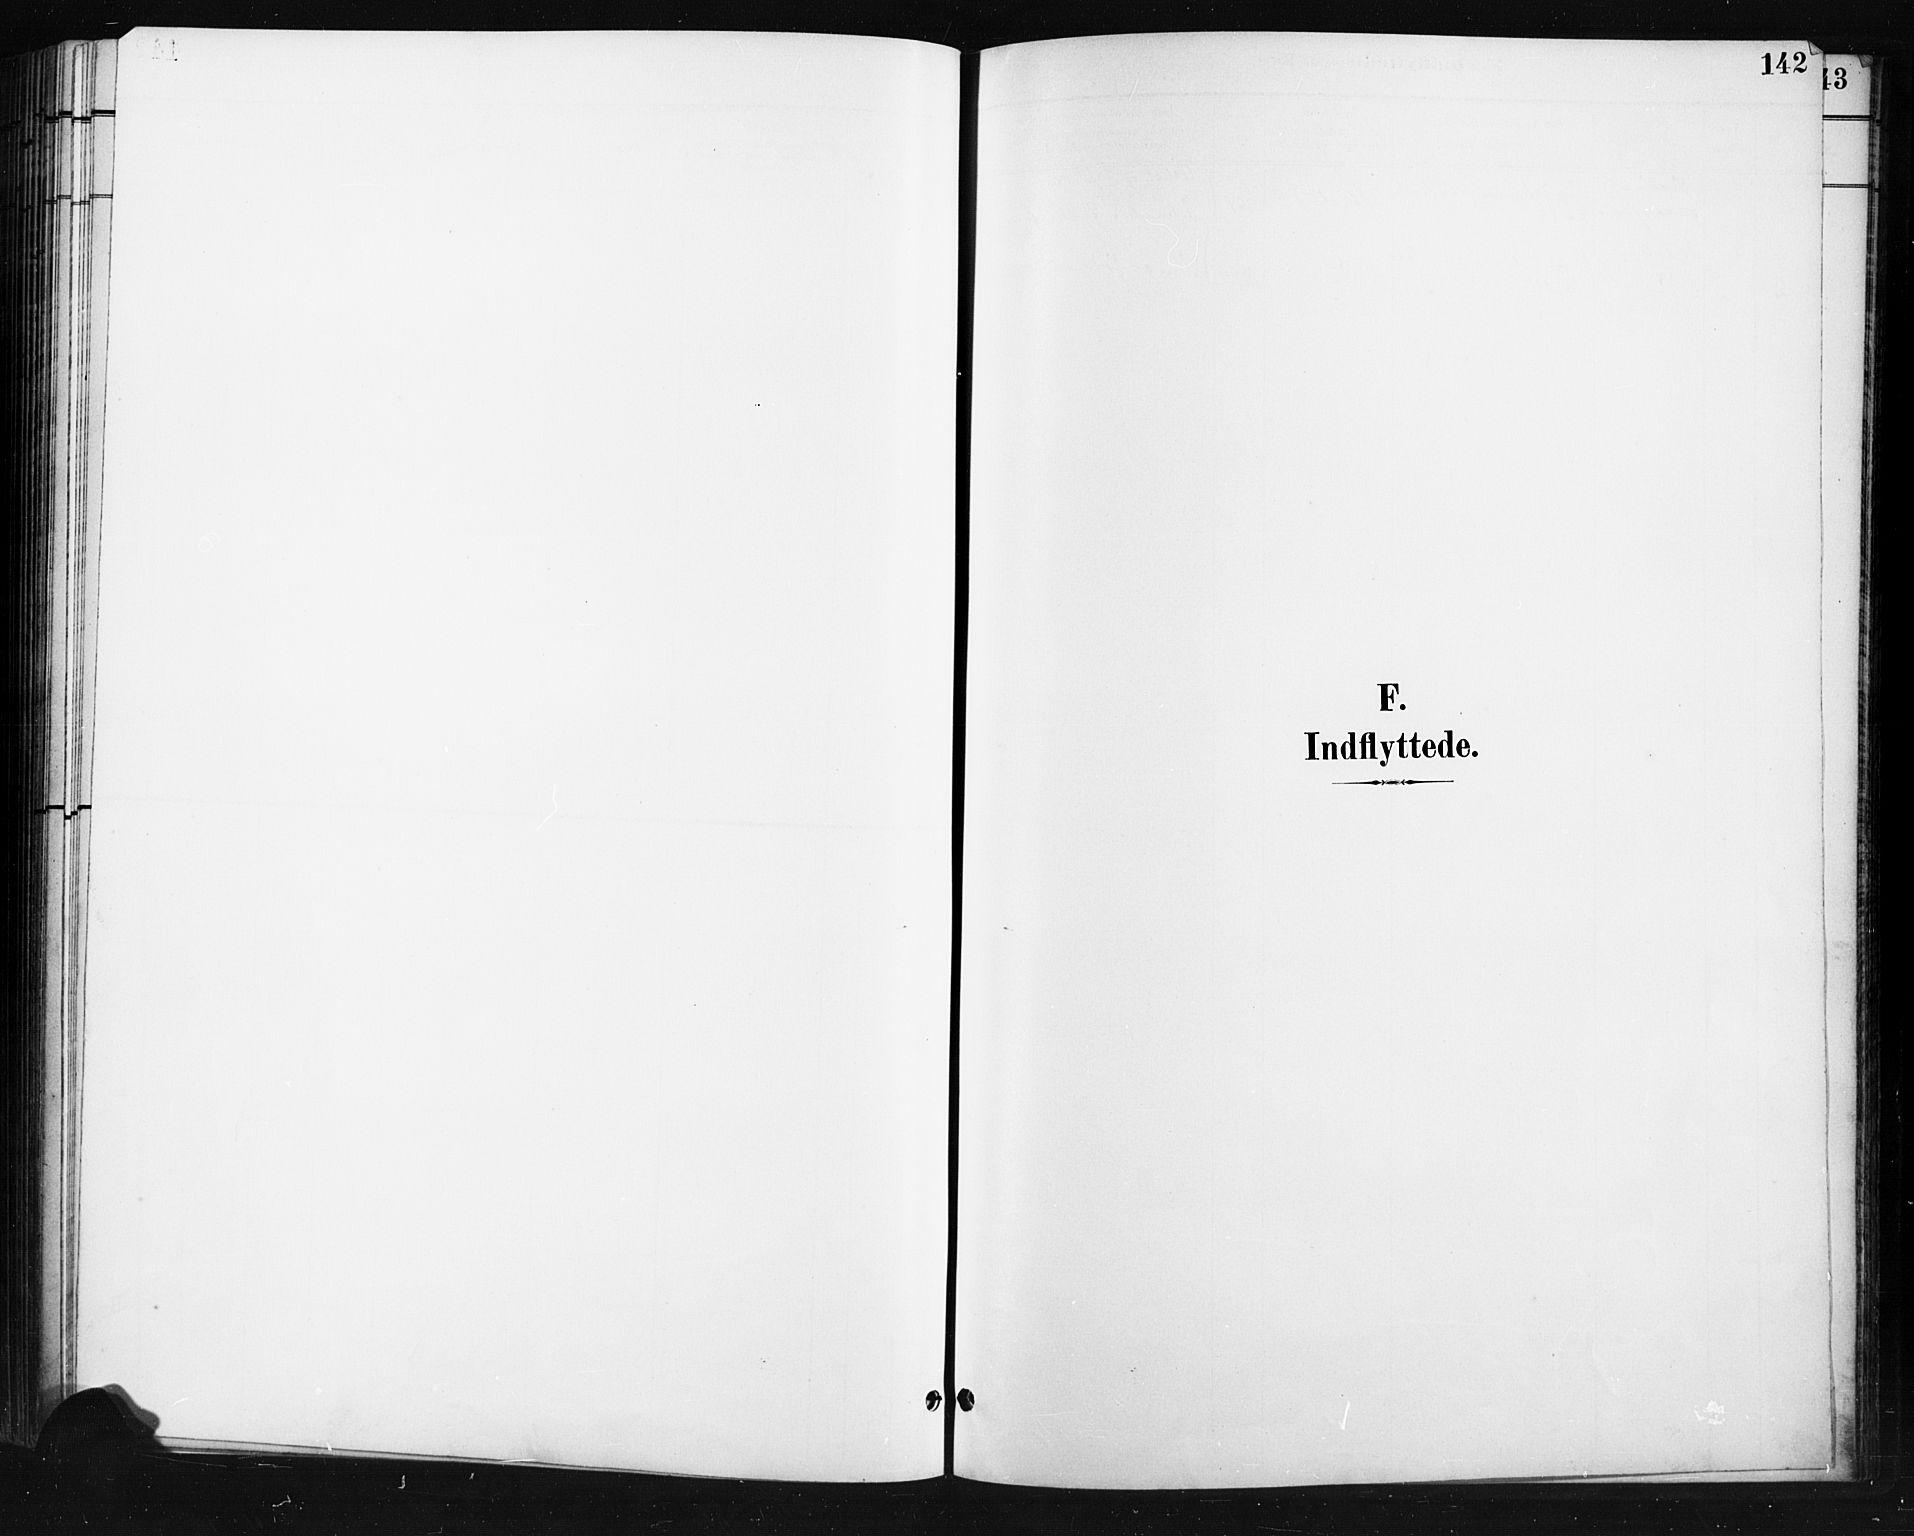 SAH, Skjåk prestekontor, Klokkerbok nr. 4, 1895-1921, s. 142